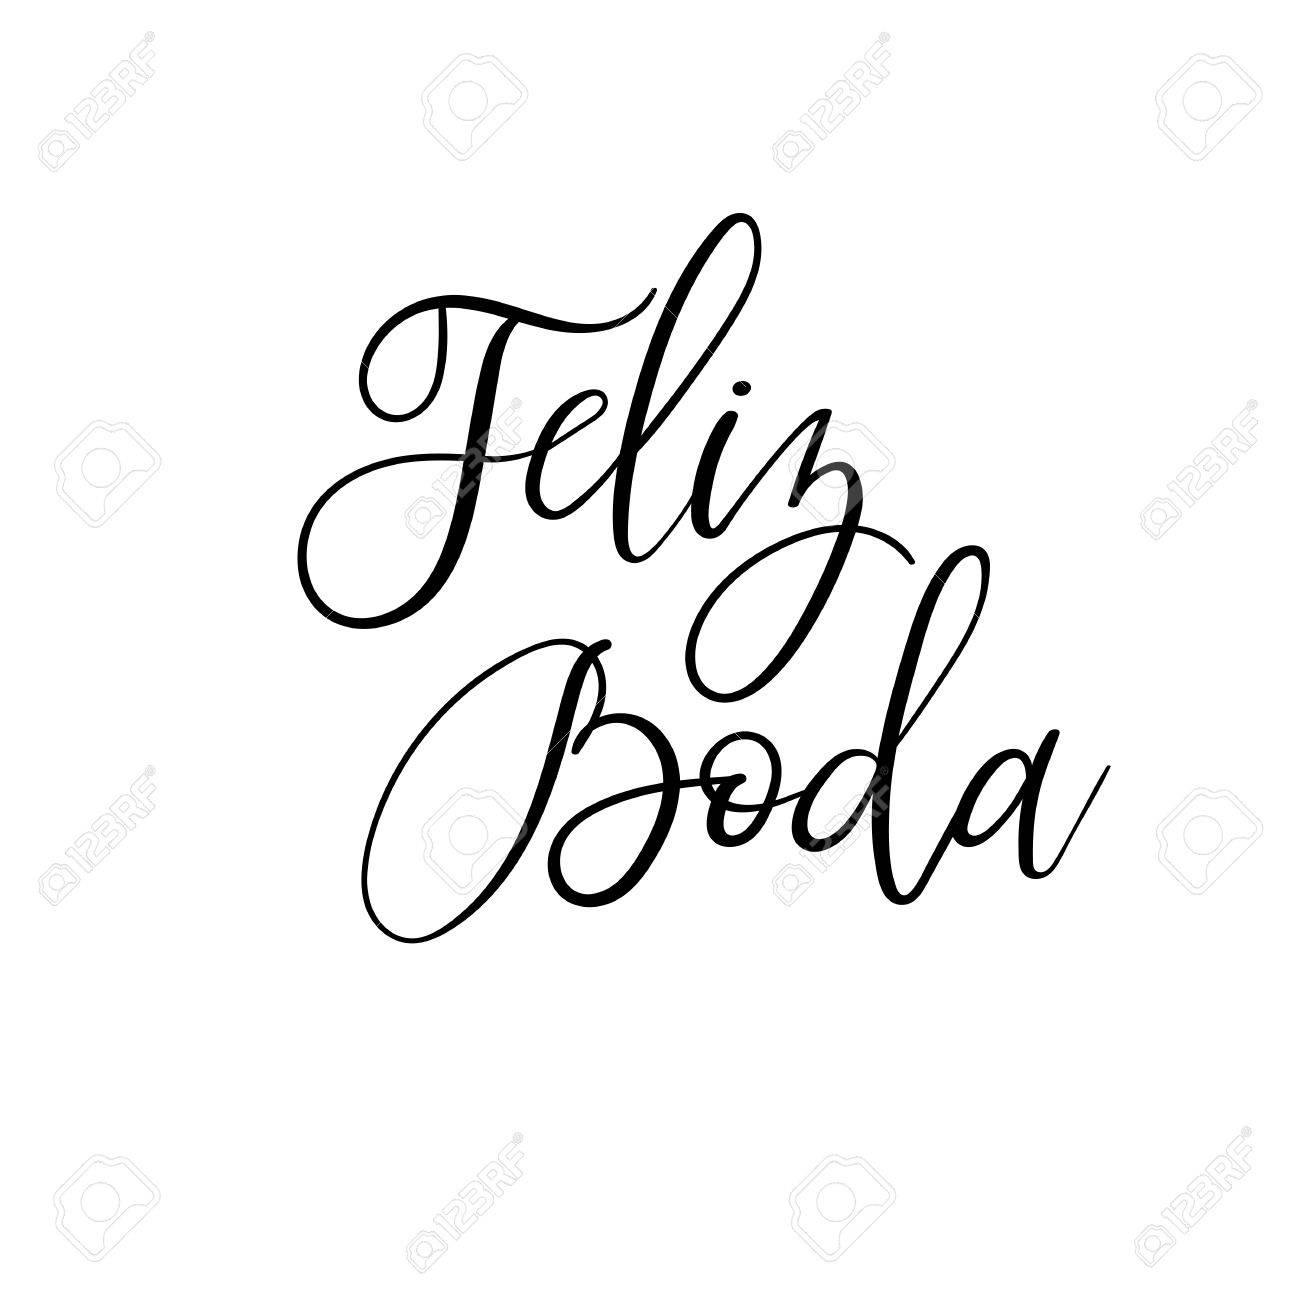 Happy Wedding Hand Lettering Text In Spanish Feliz Boda Calligraphy